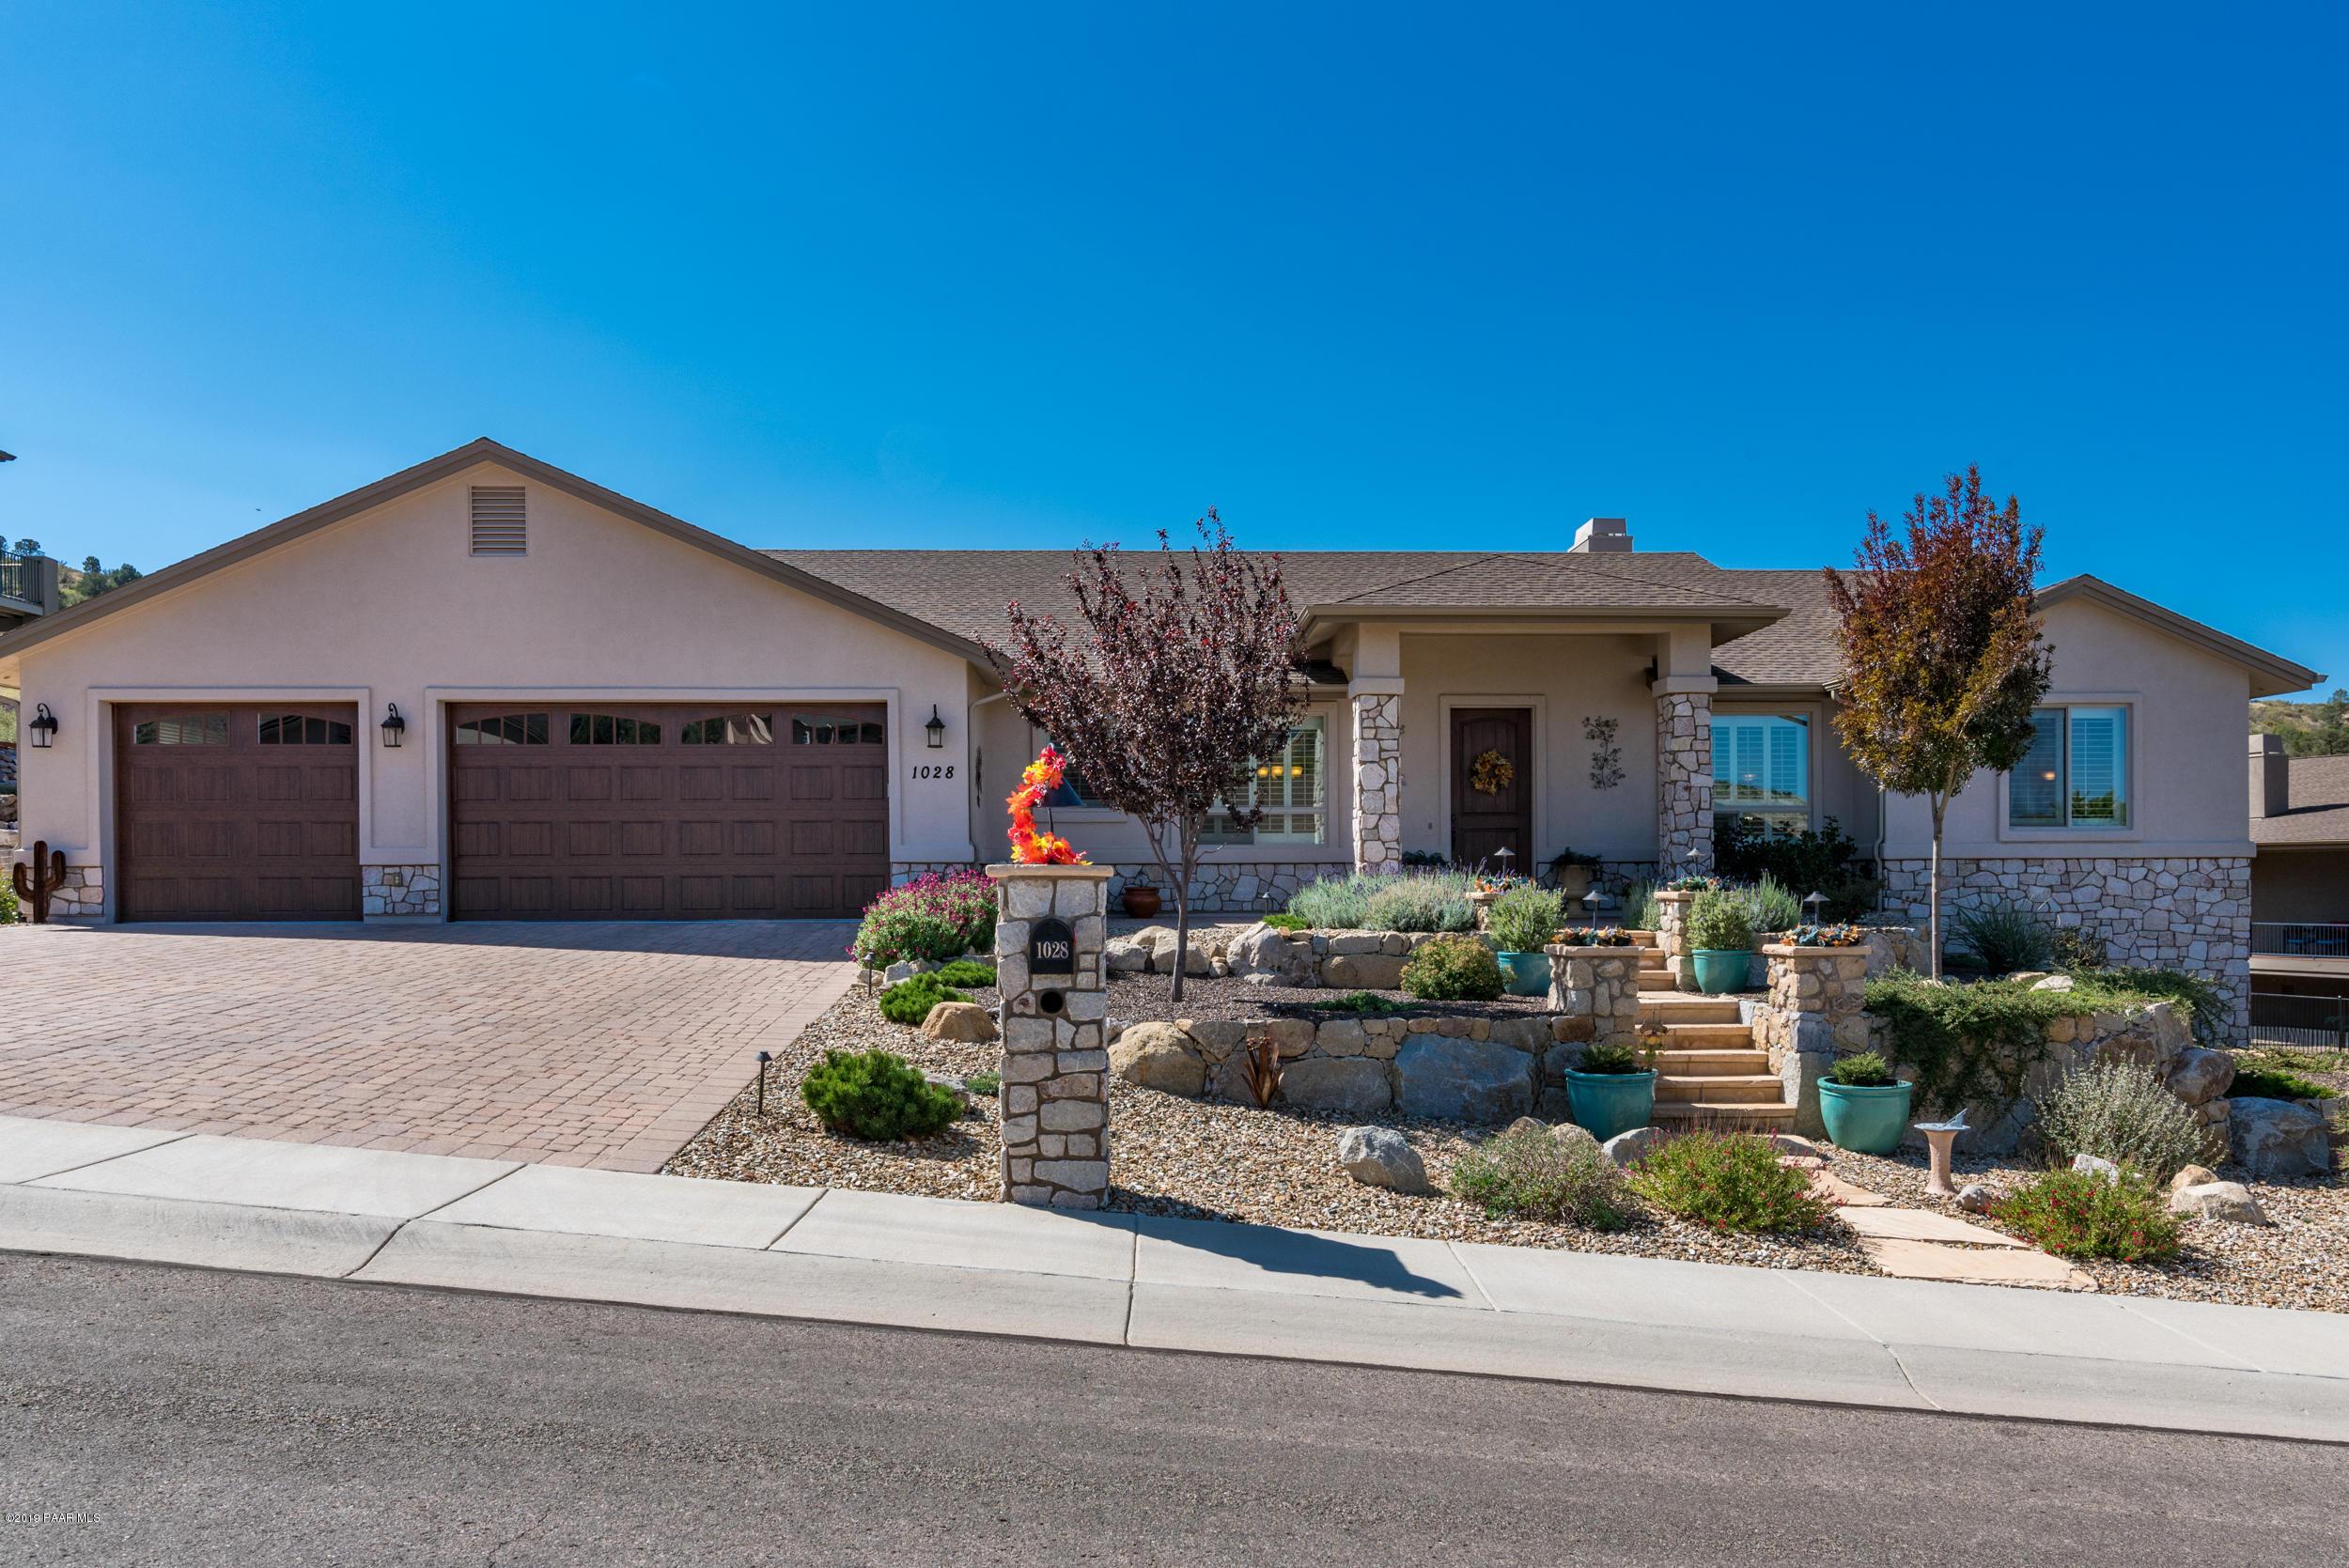 Photo of 1028 Picket, Prescott, AZ 86301